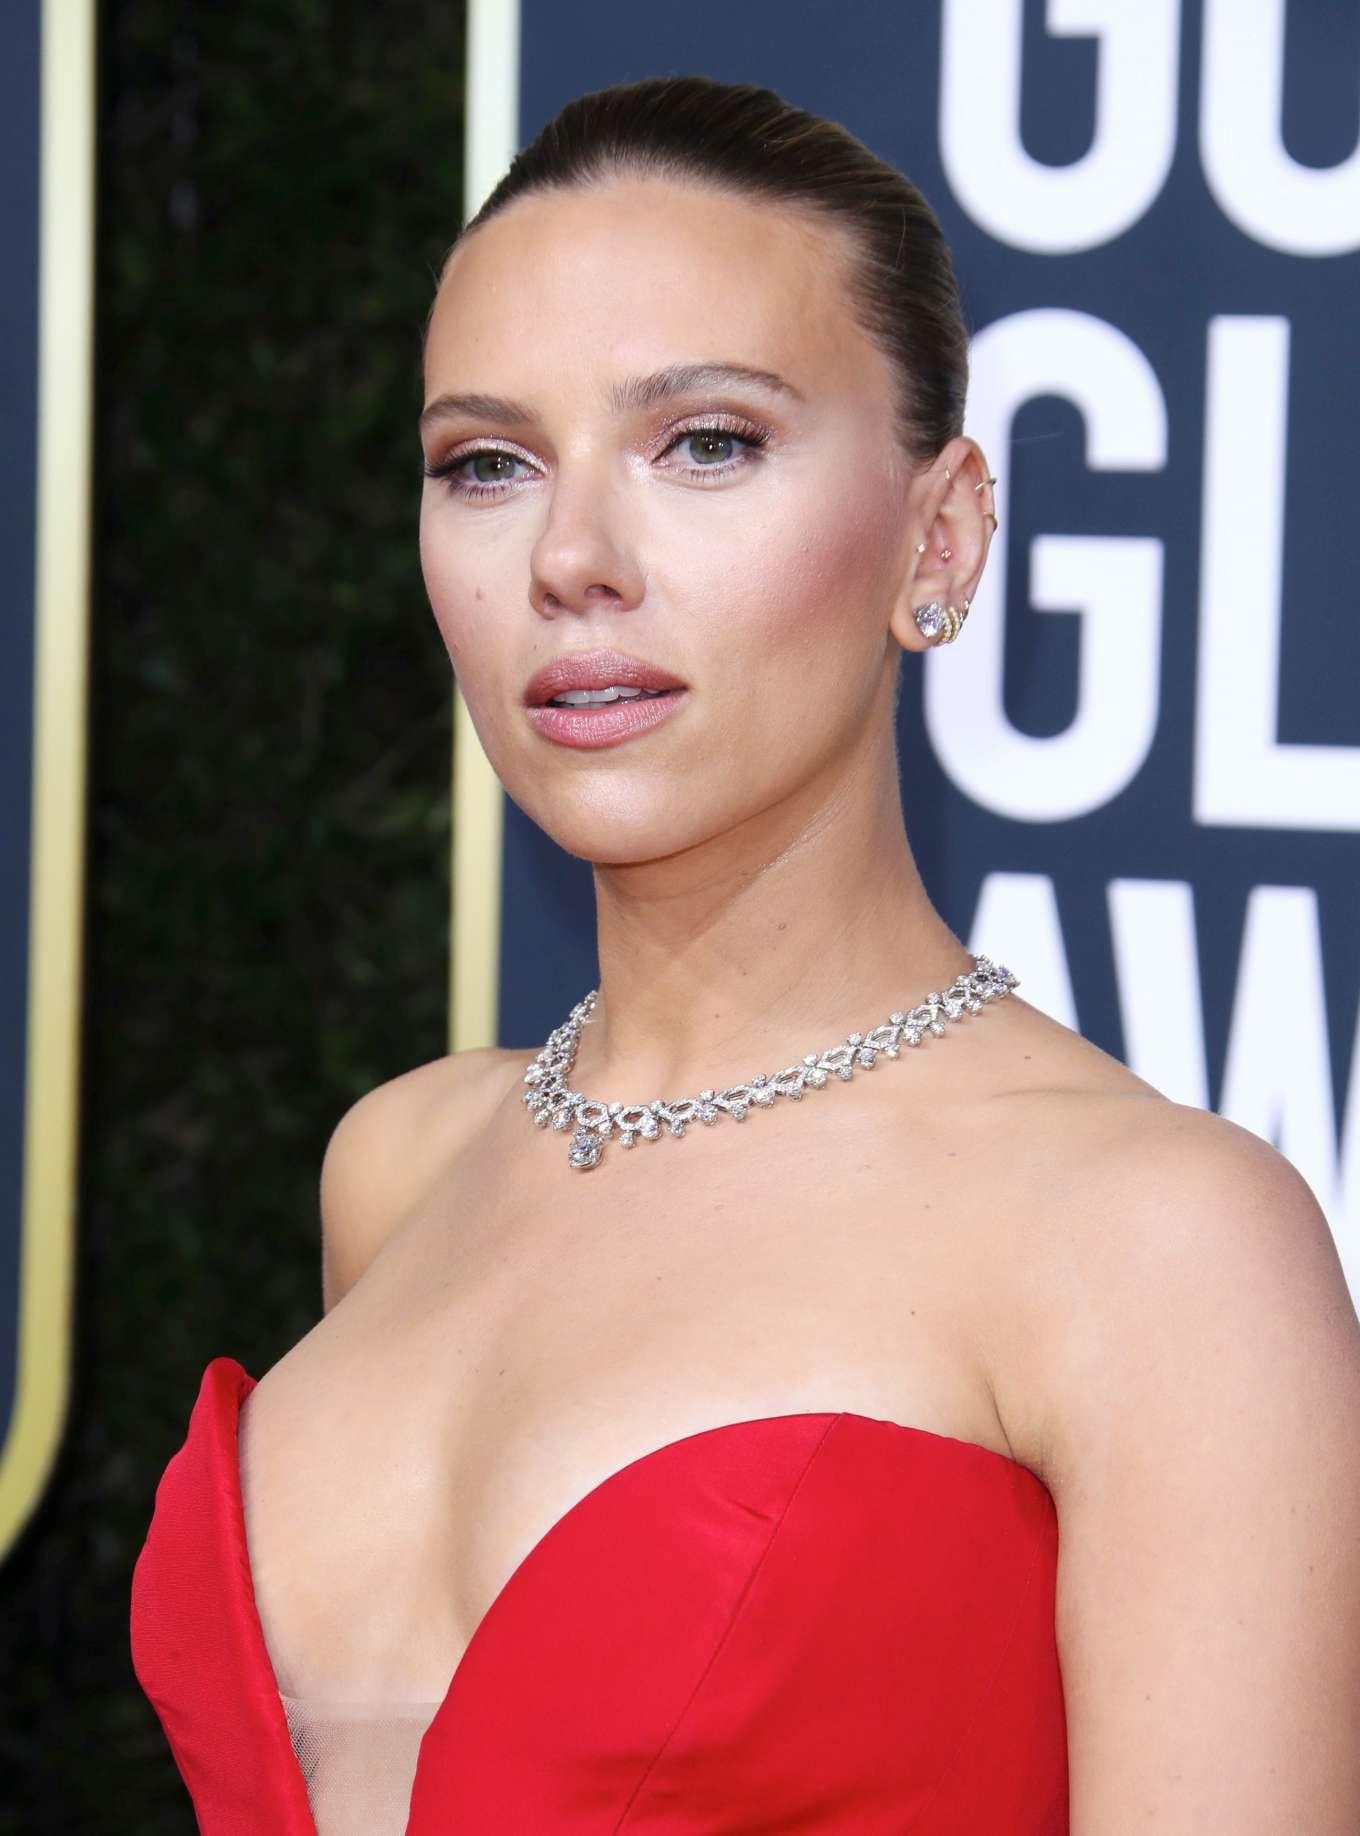 Scarlett Johansson Nude [2021 ULTIMATE Collection] - OkDIO